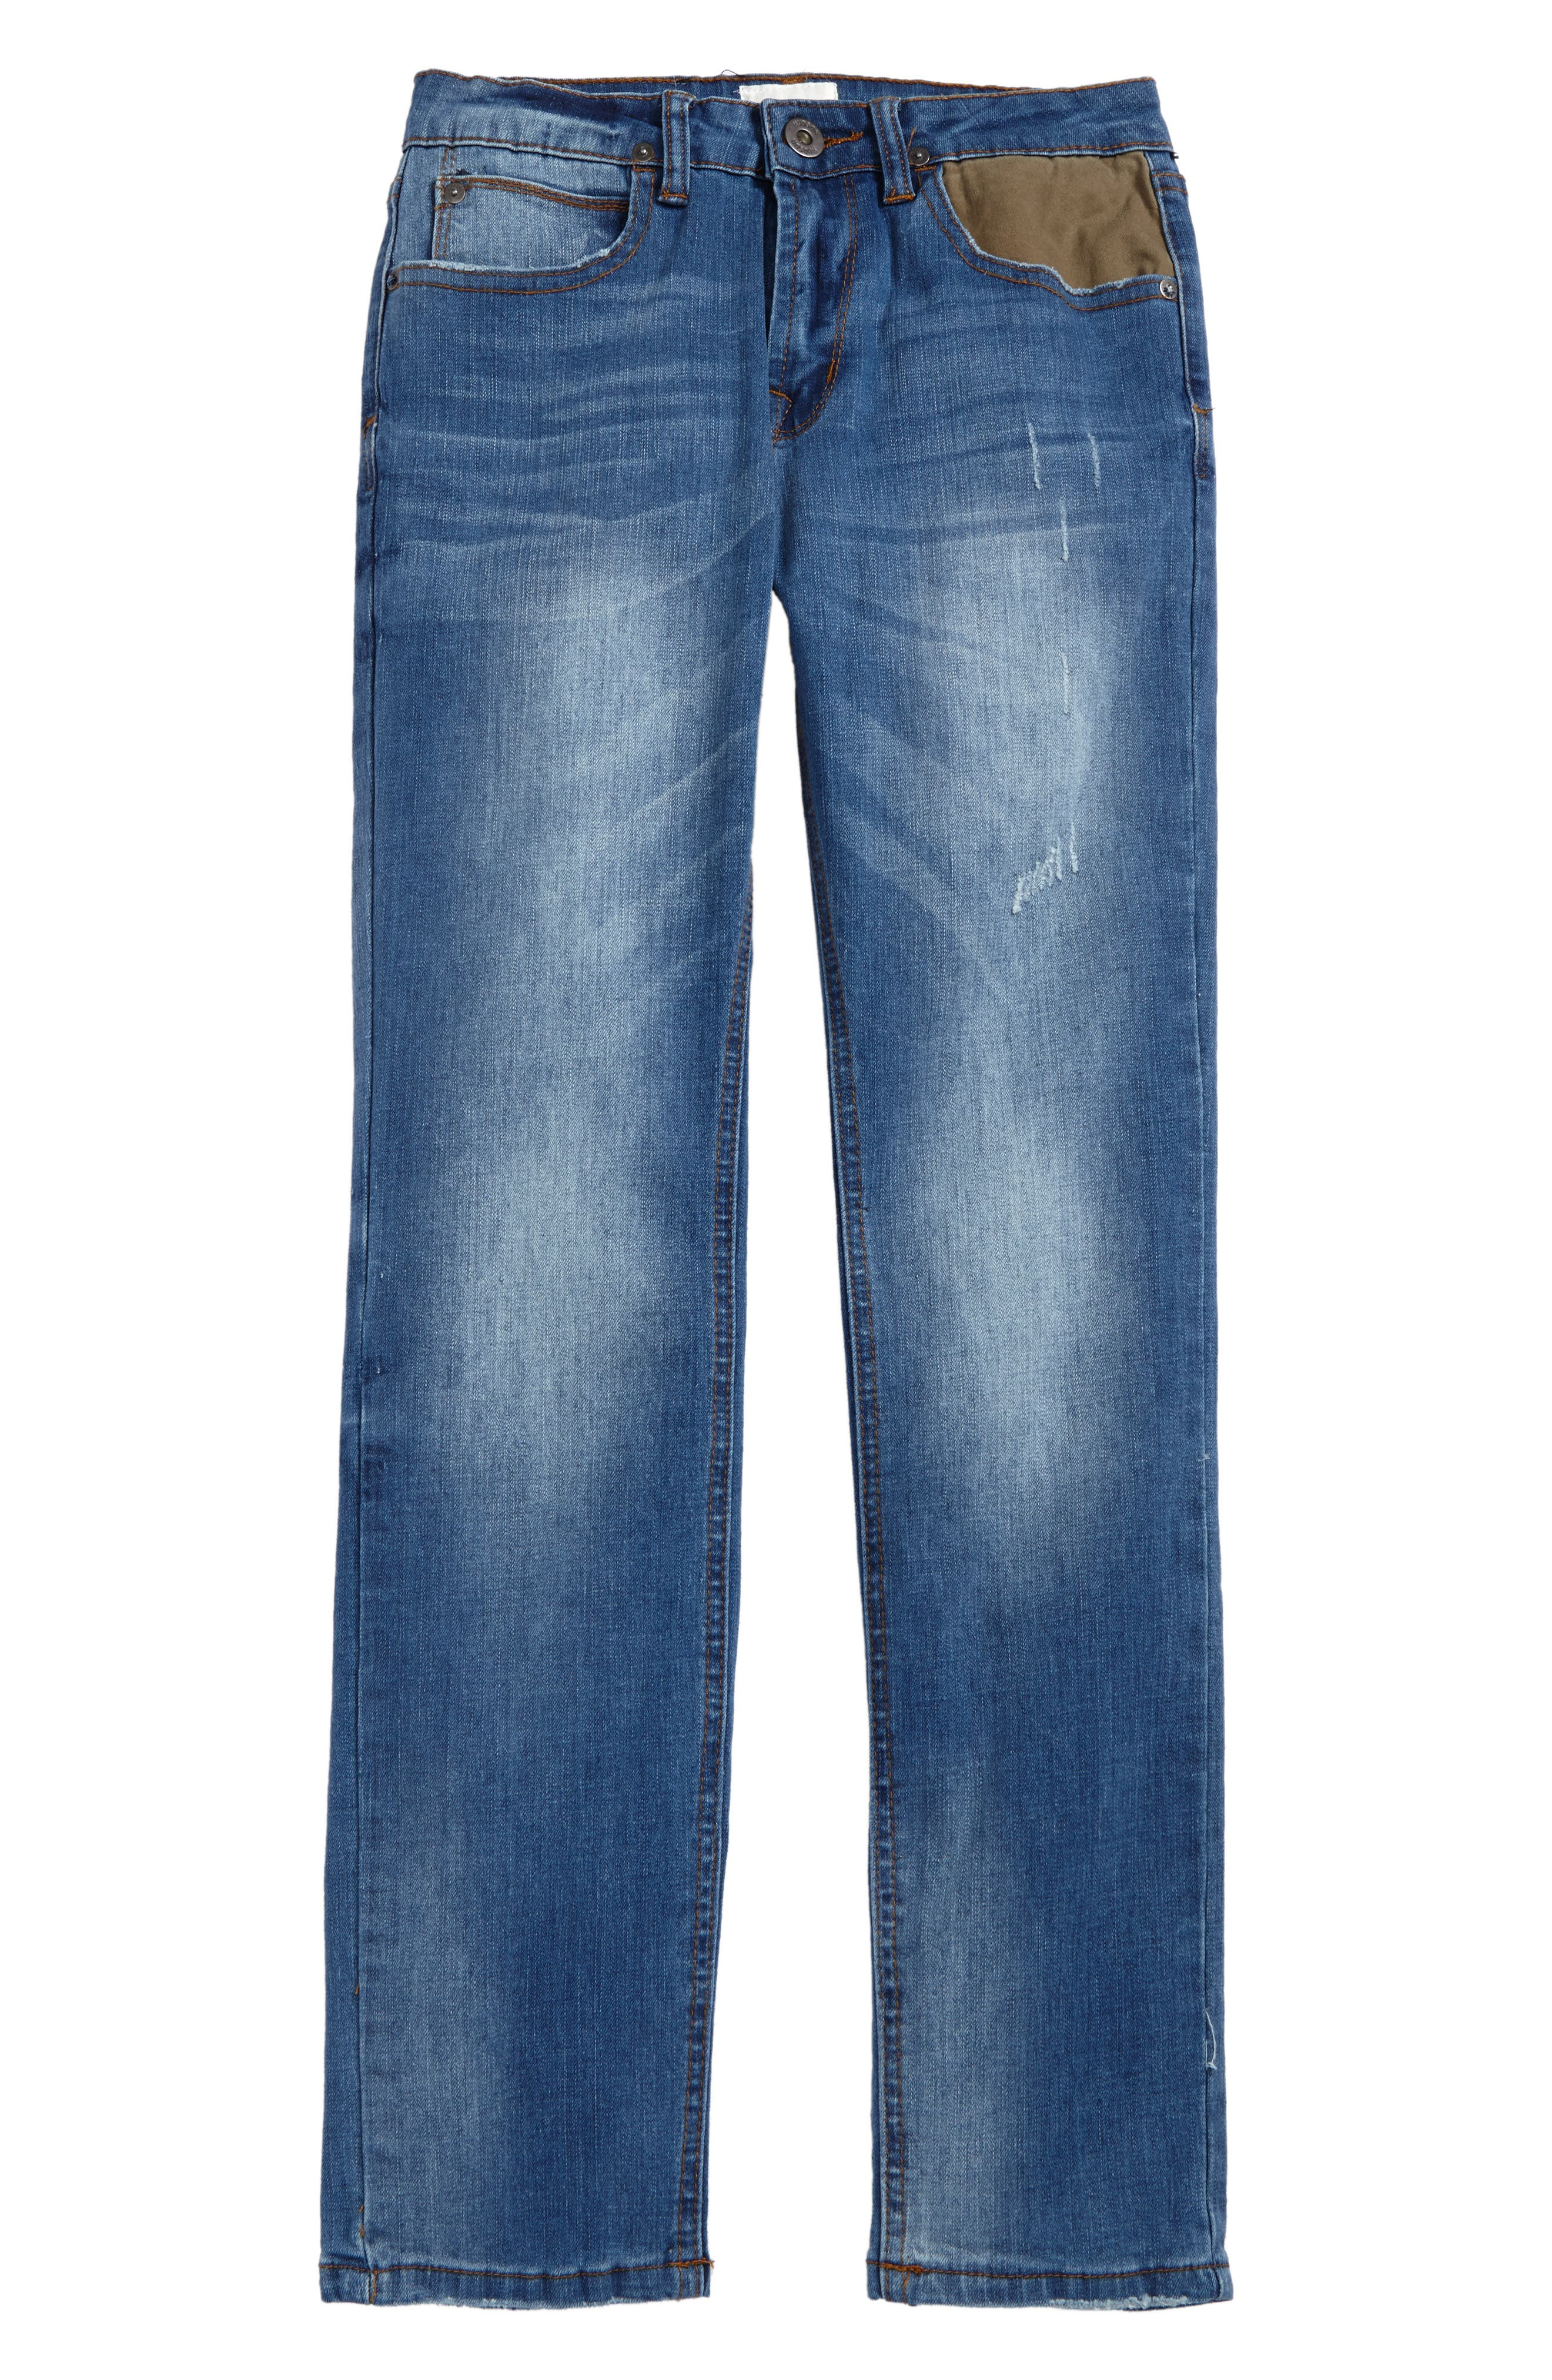 Jagger Slim Fit Straight Leg Jeans,                         Main,                         color, Zenith